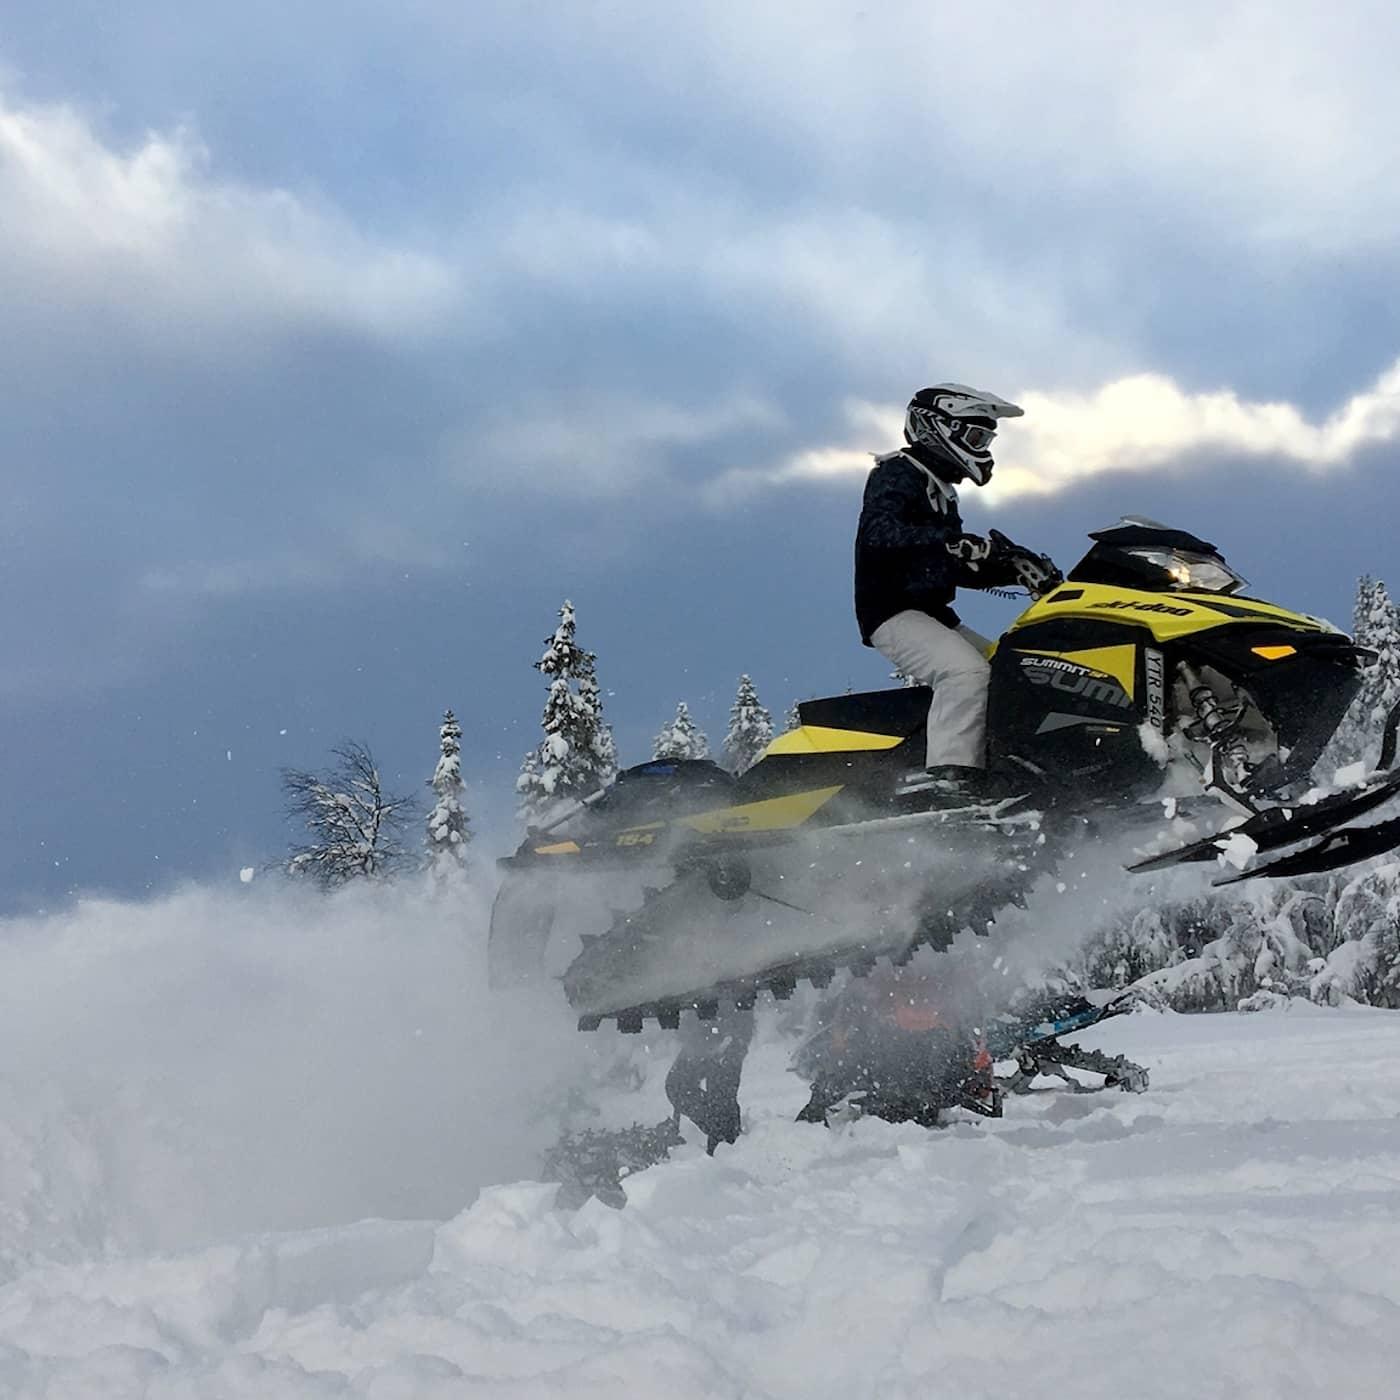 När snöskotern blir en livsstil